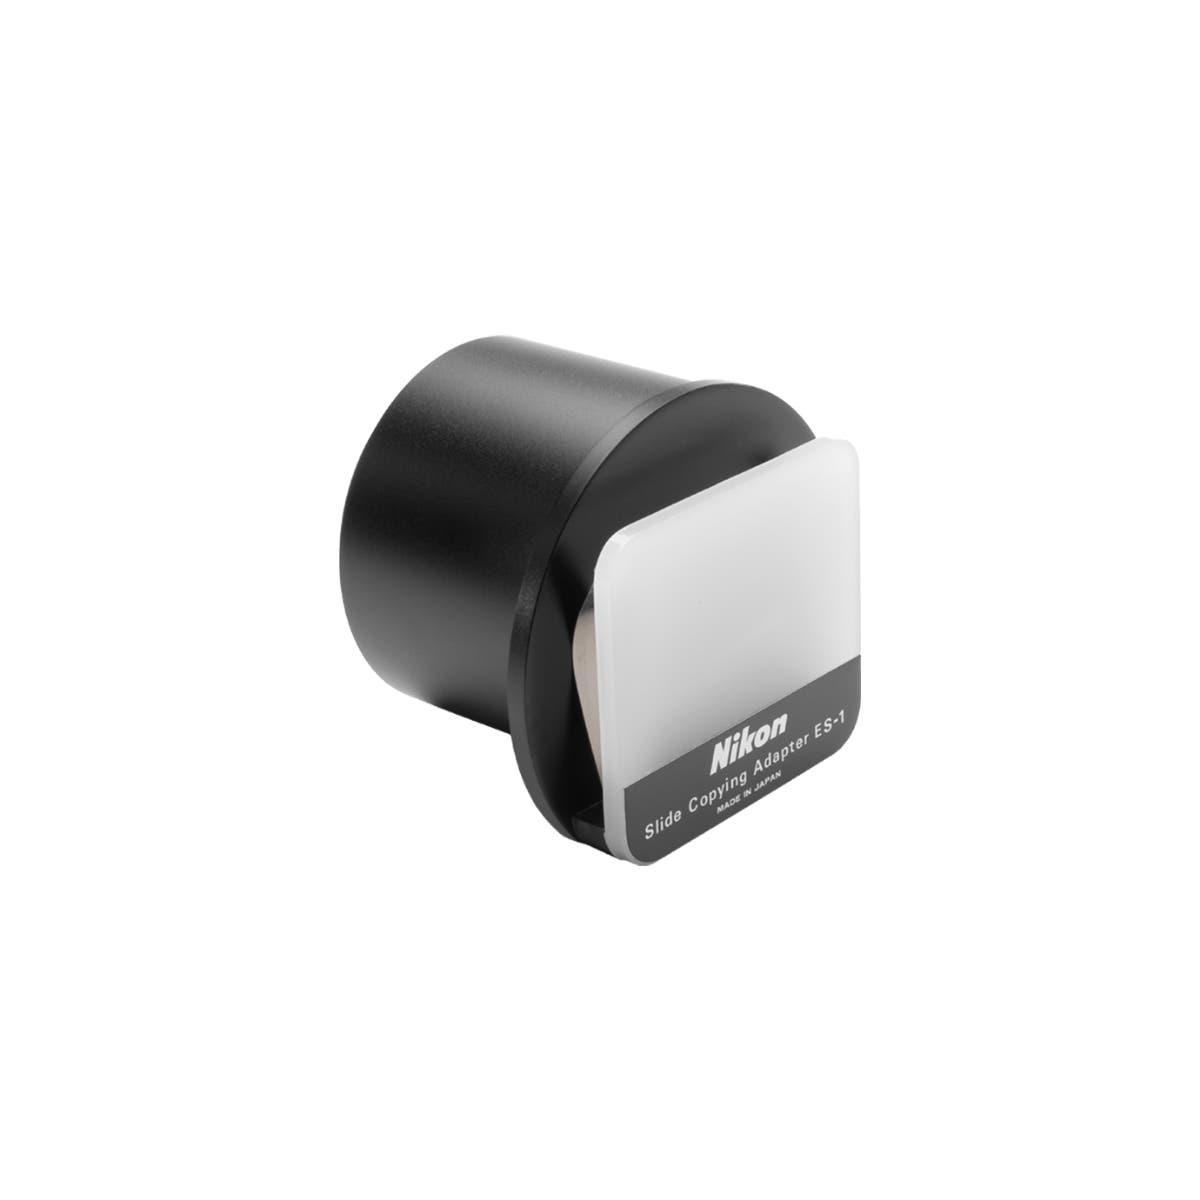 ES-1 Slide Copy Adapter